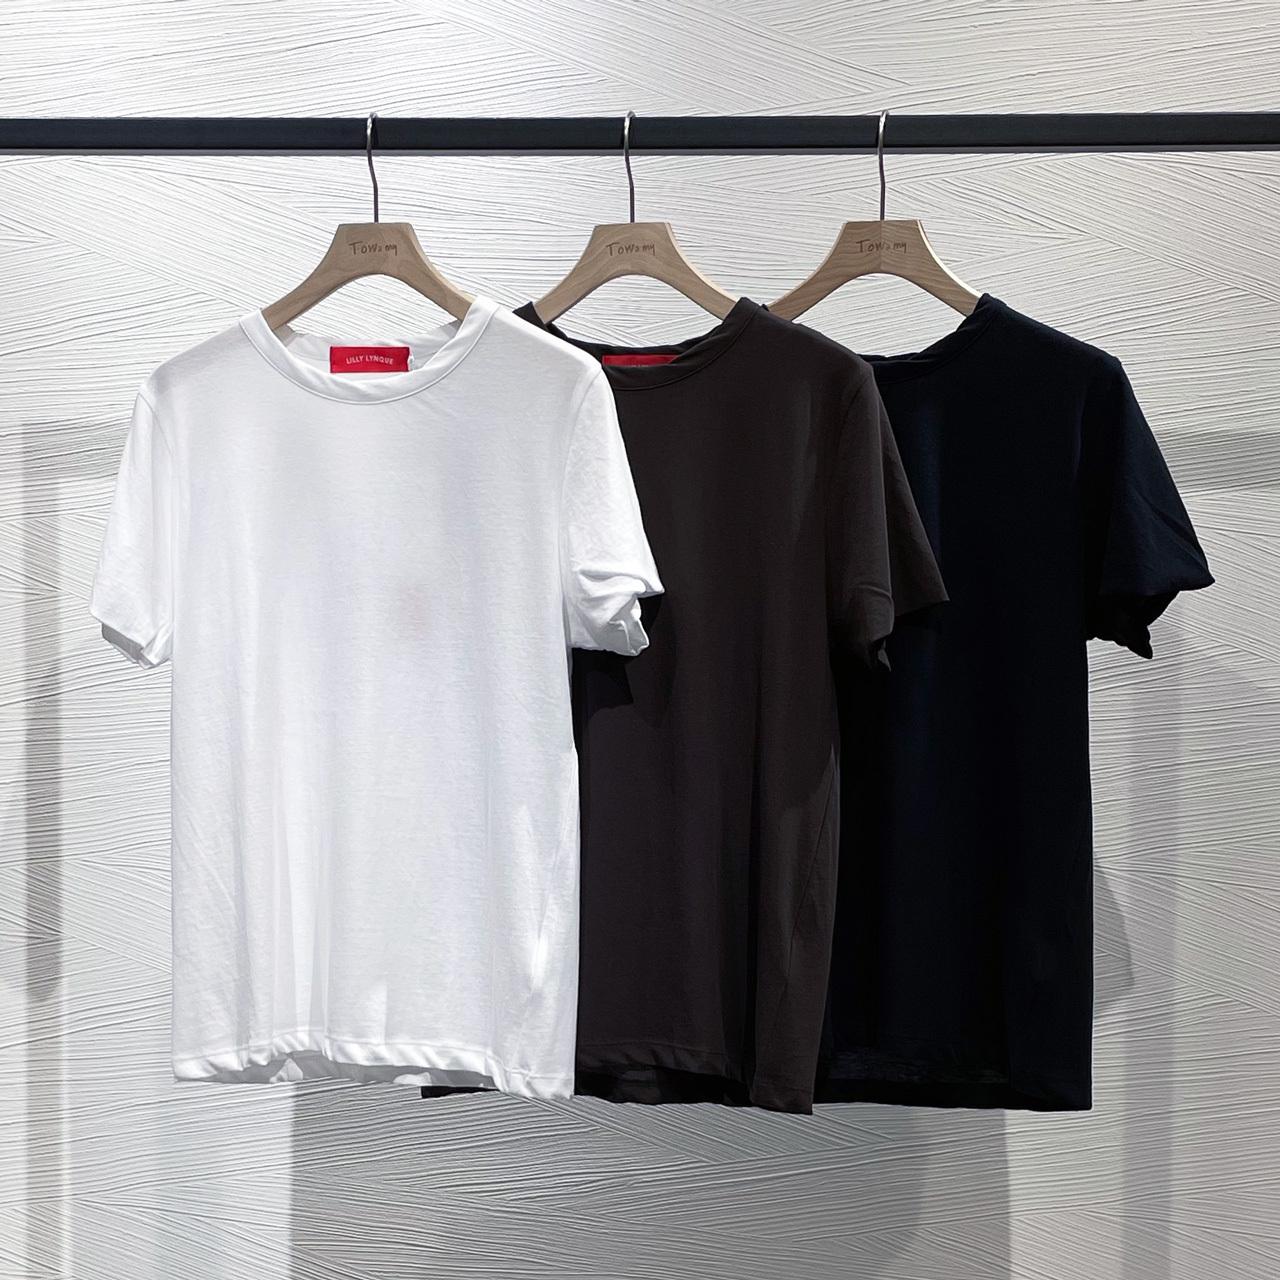 FRESCA クルーネックTシャツ